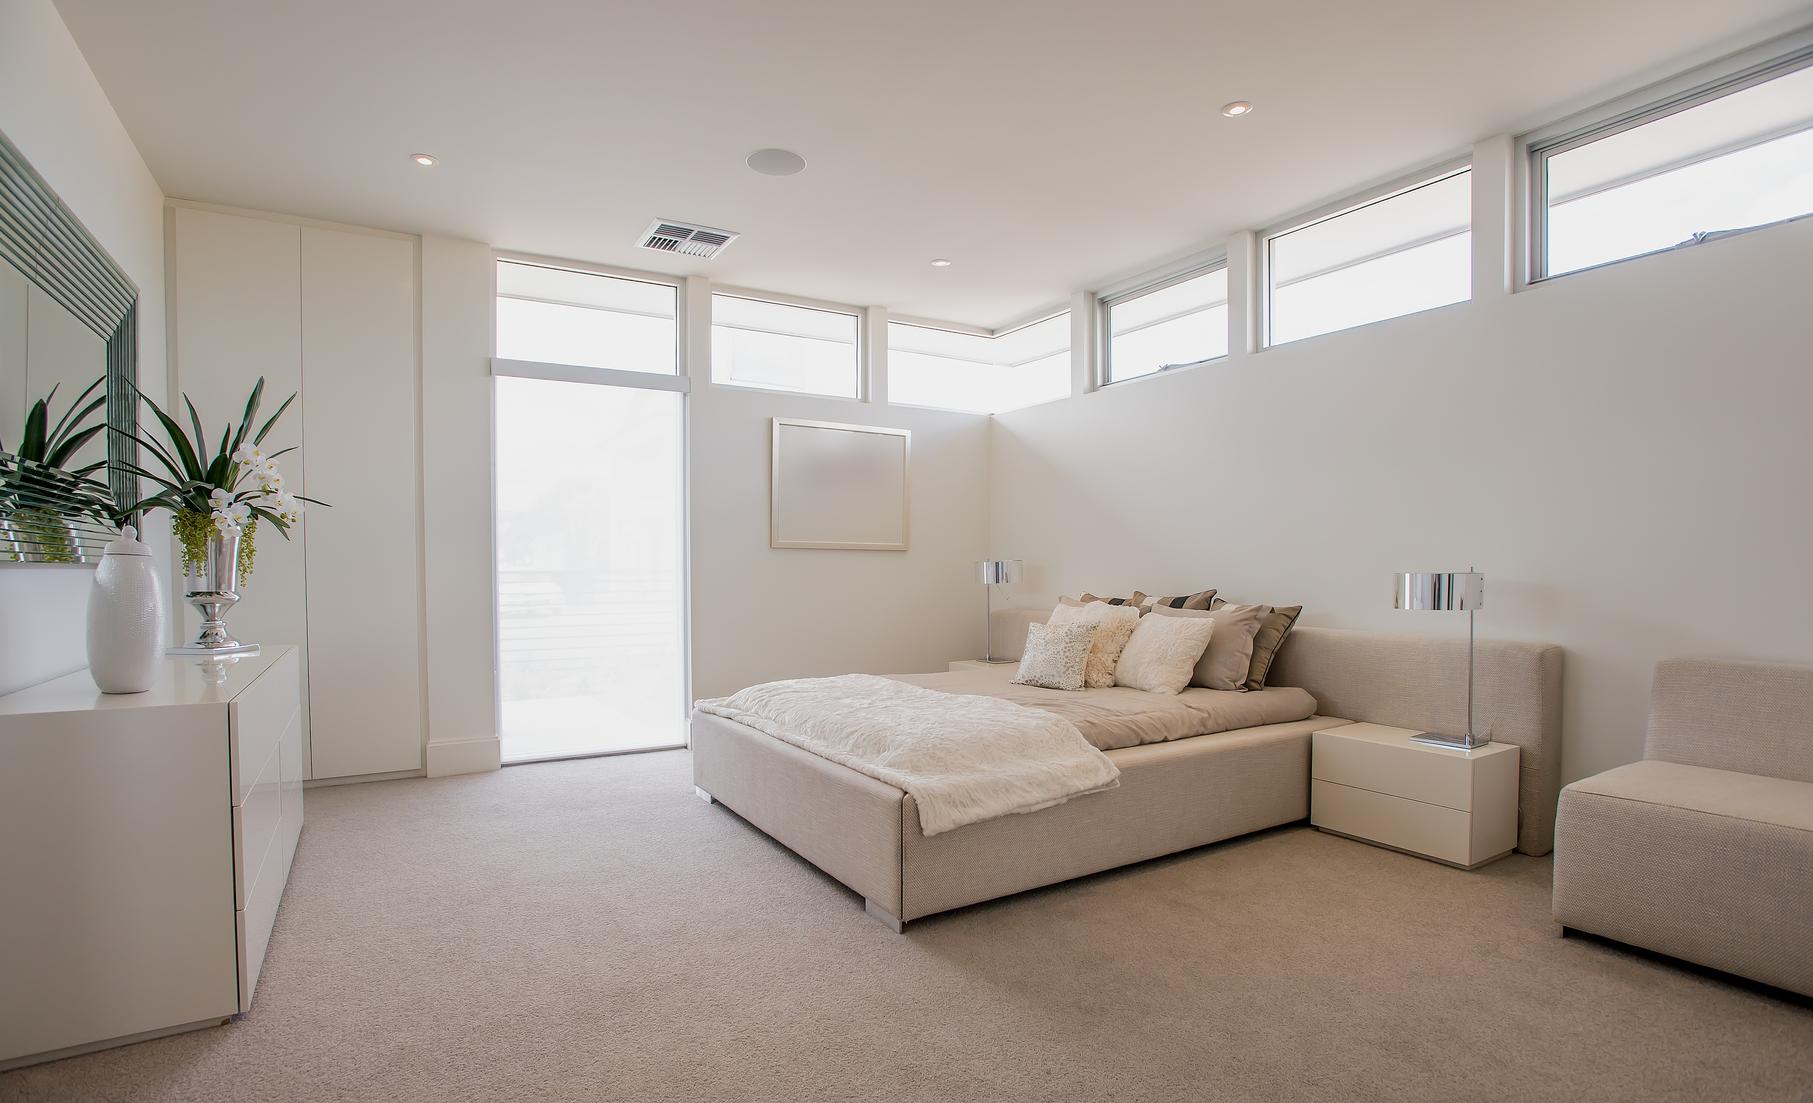 How To Make Small Bedrooms Look Bigger Dom Jakie Kolory Wybrać Do Domu